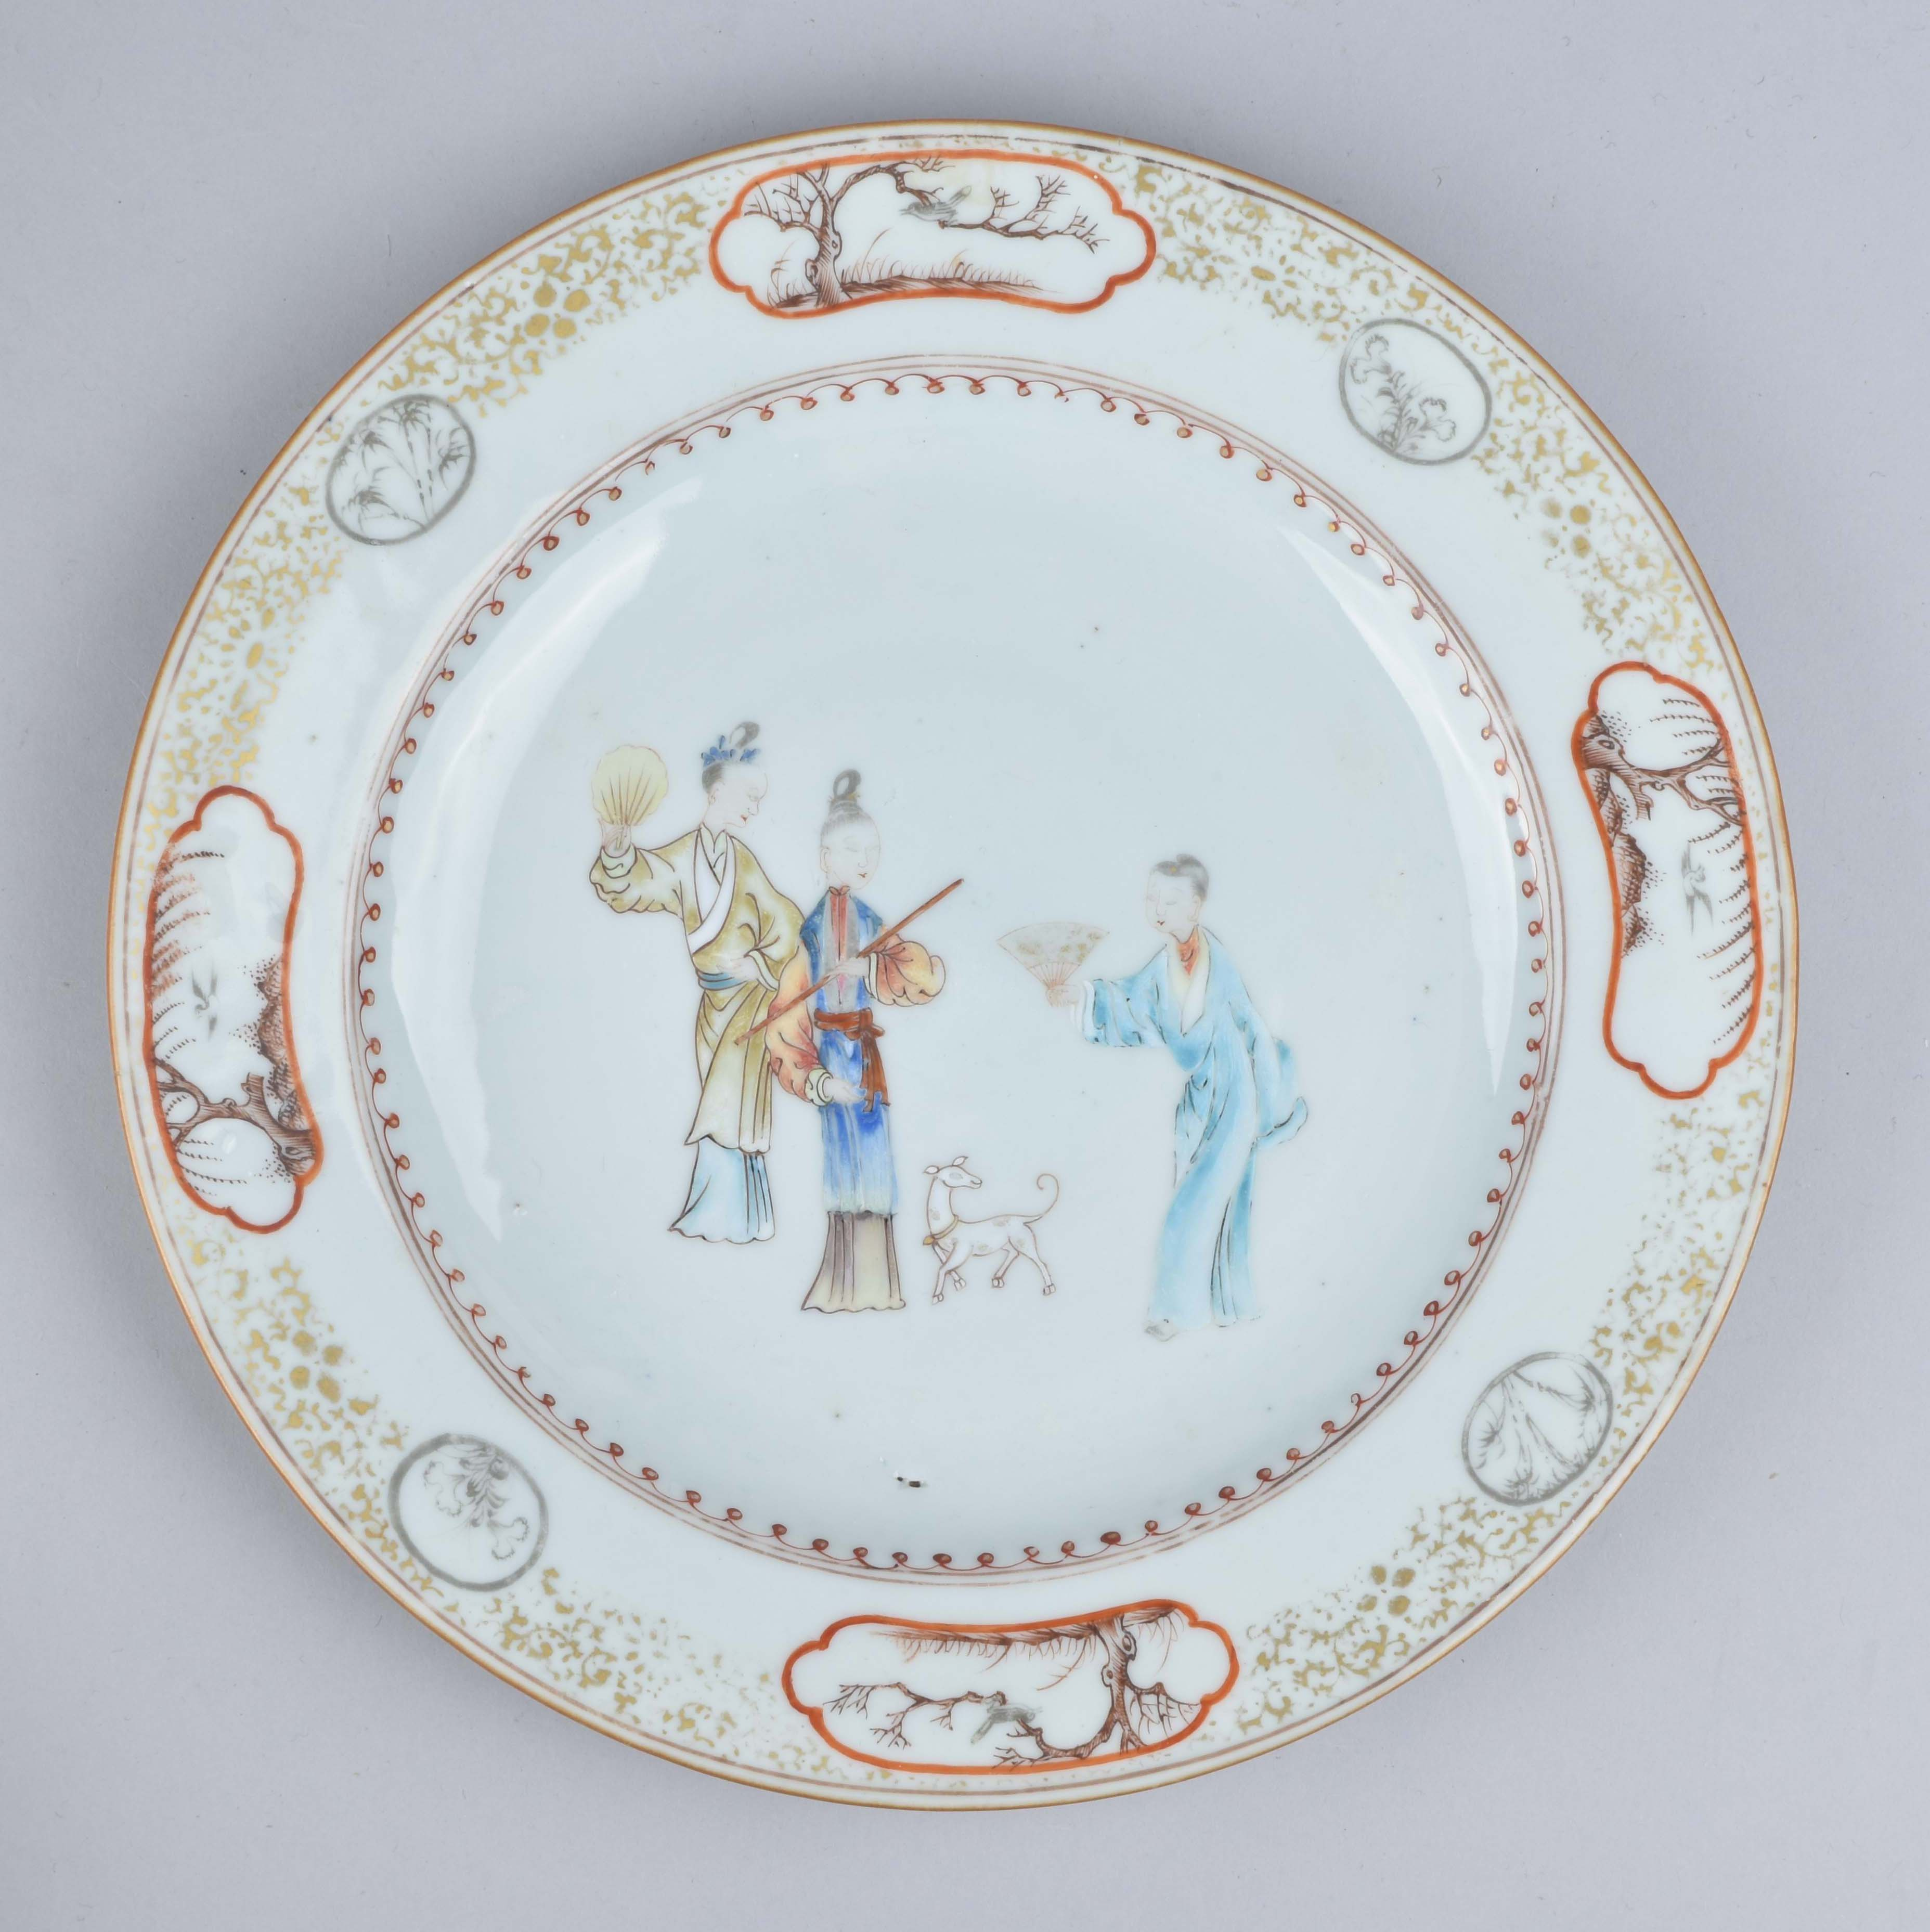 Famille rose Porcelain Qianlong period (1736-1795), China